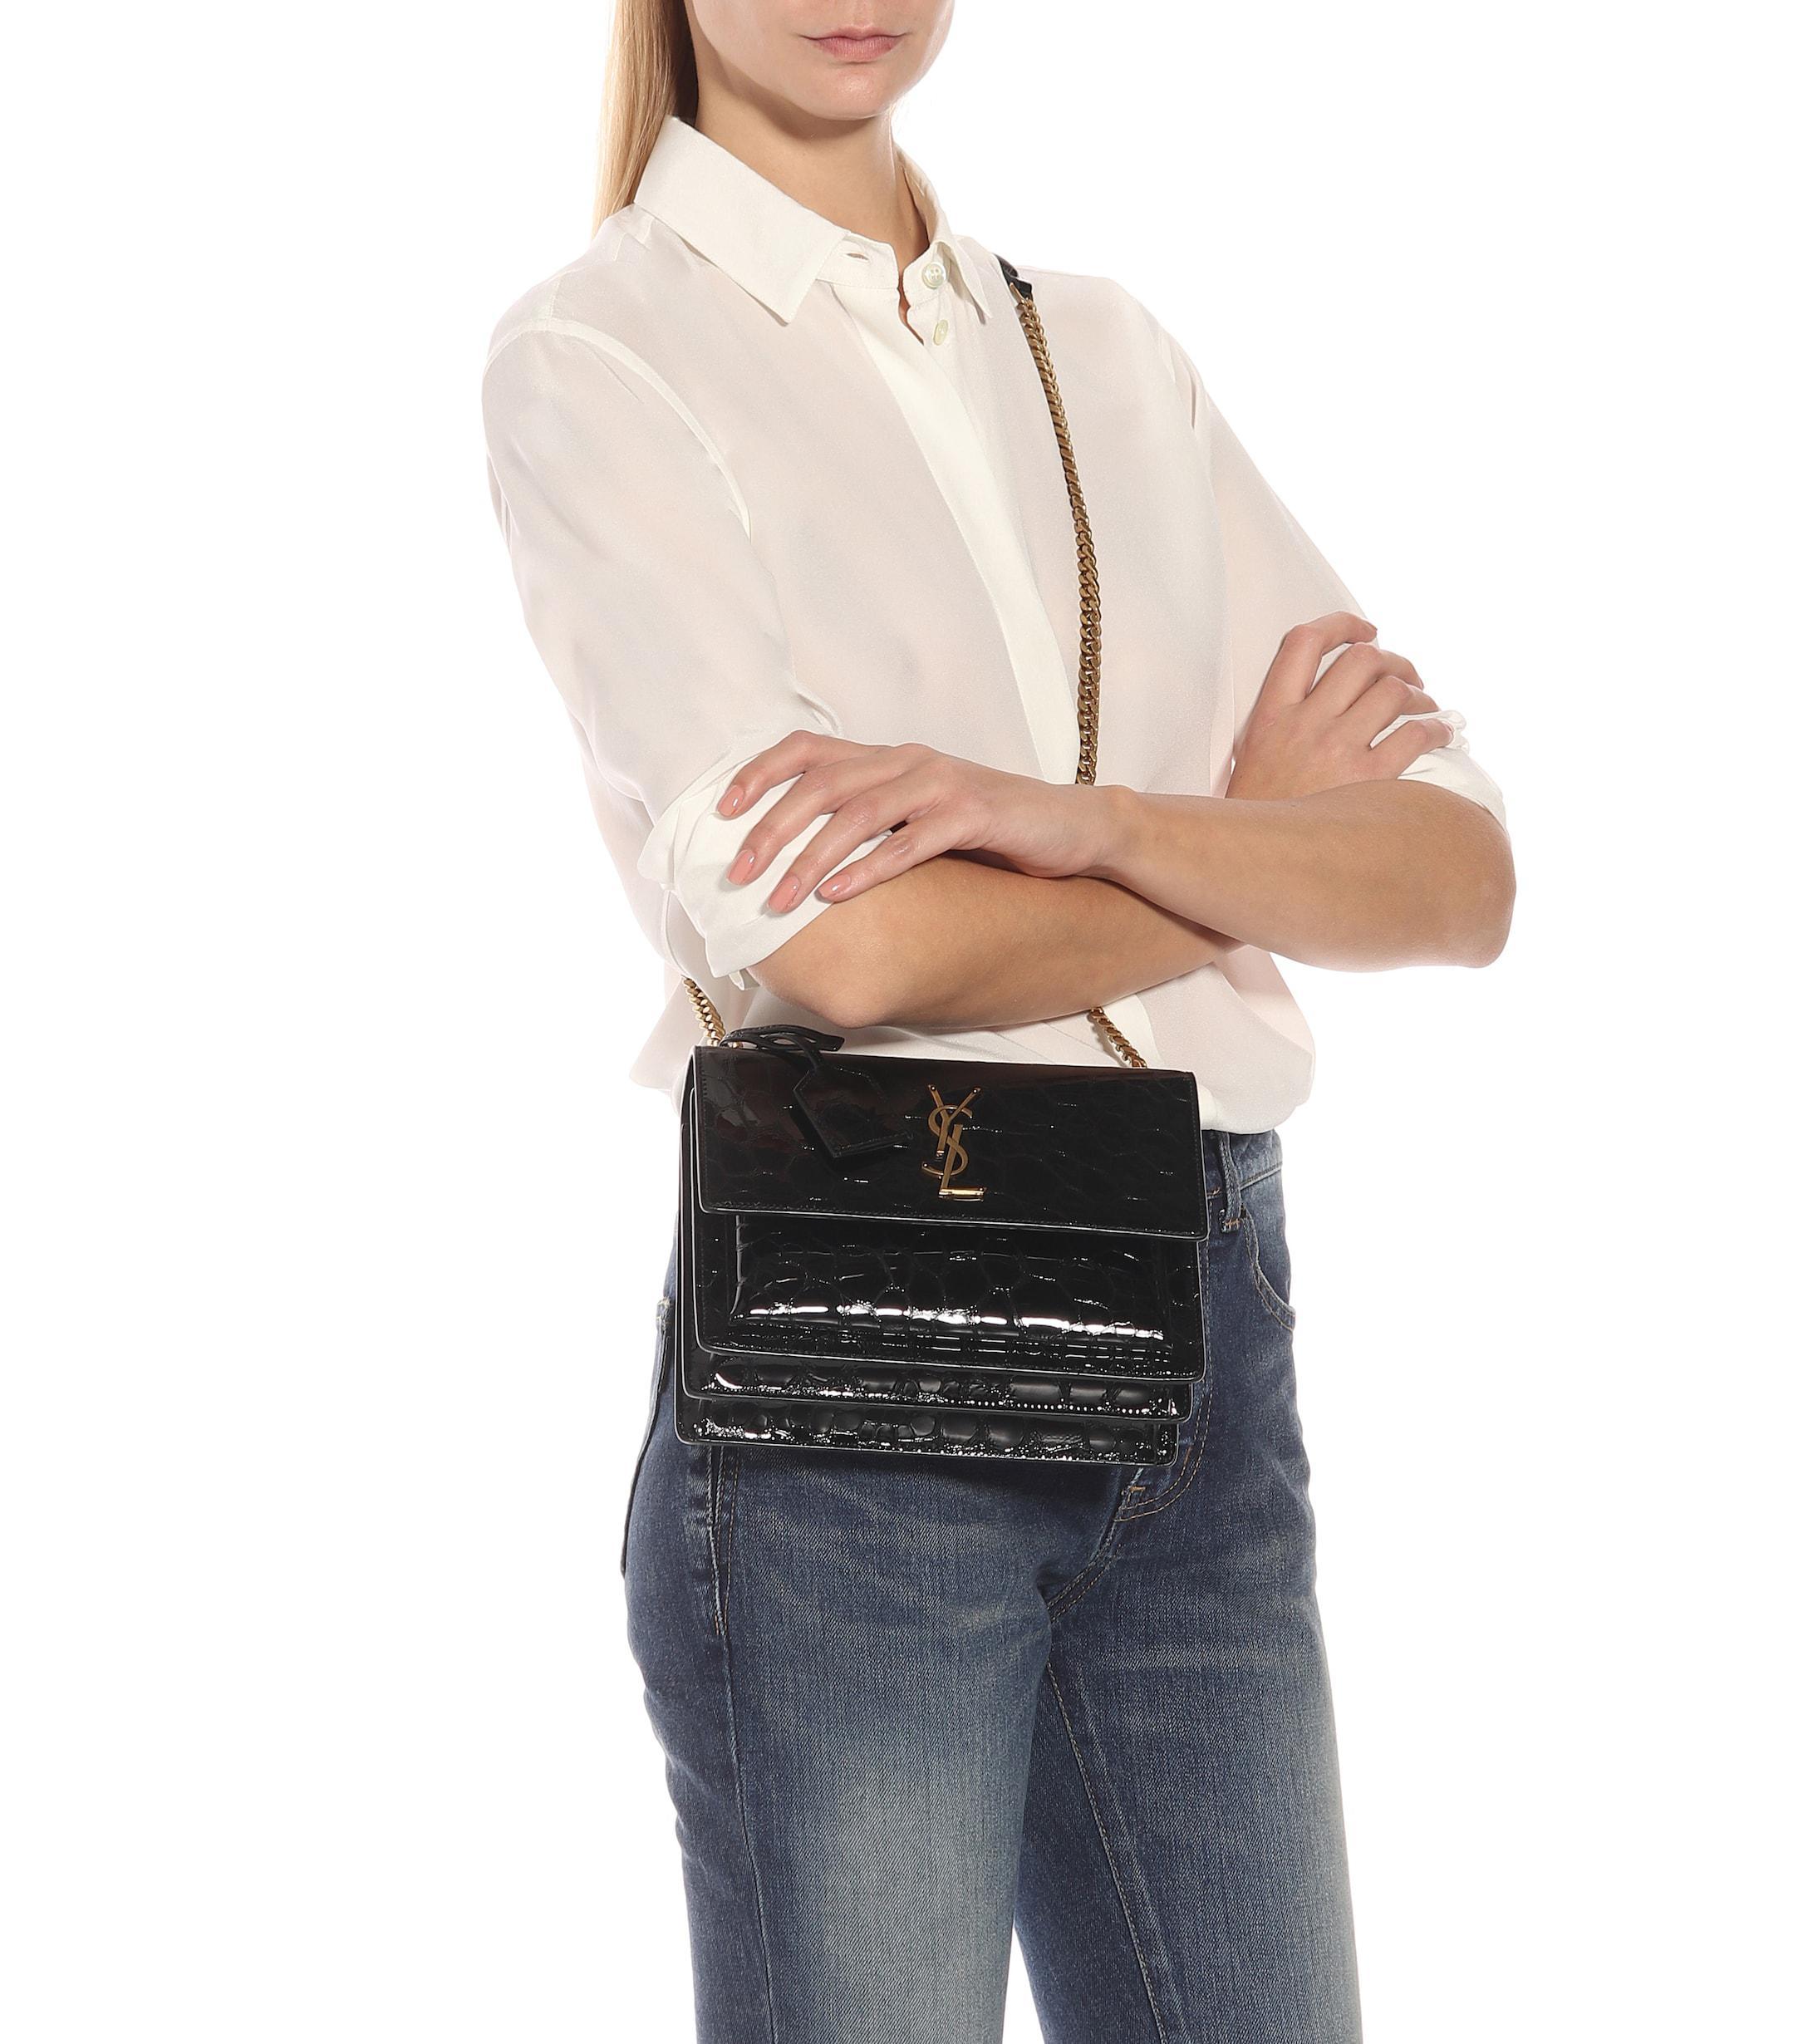 04f3cd8a14 Saint Laurent - Black Medium Sunset Monogram Shoulder Bag - Lyst. View  fullscreen